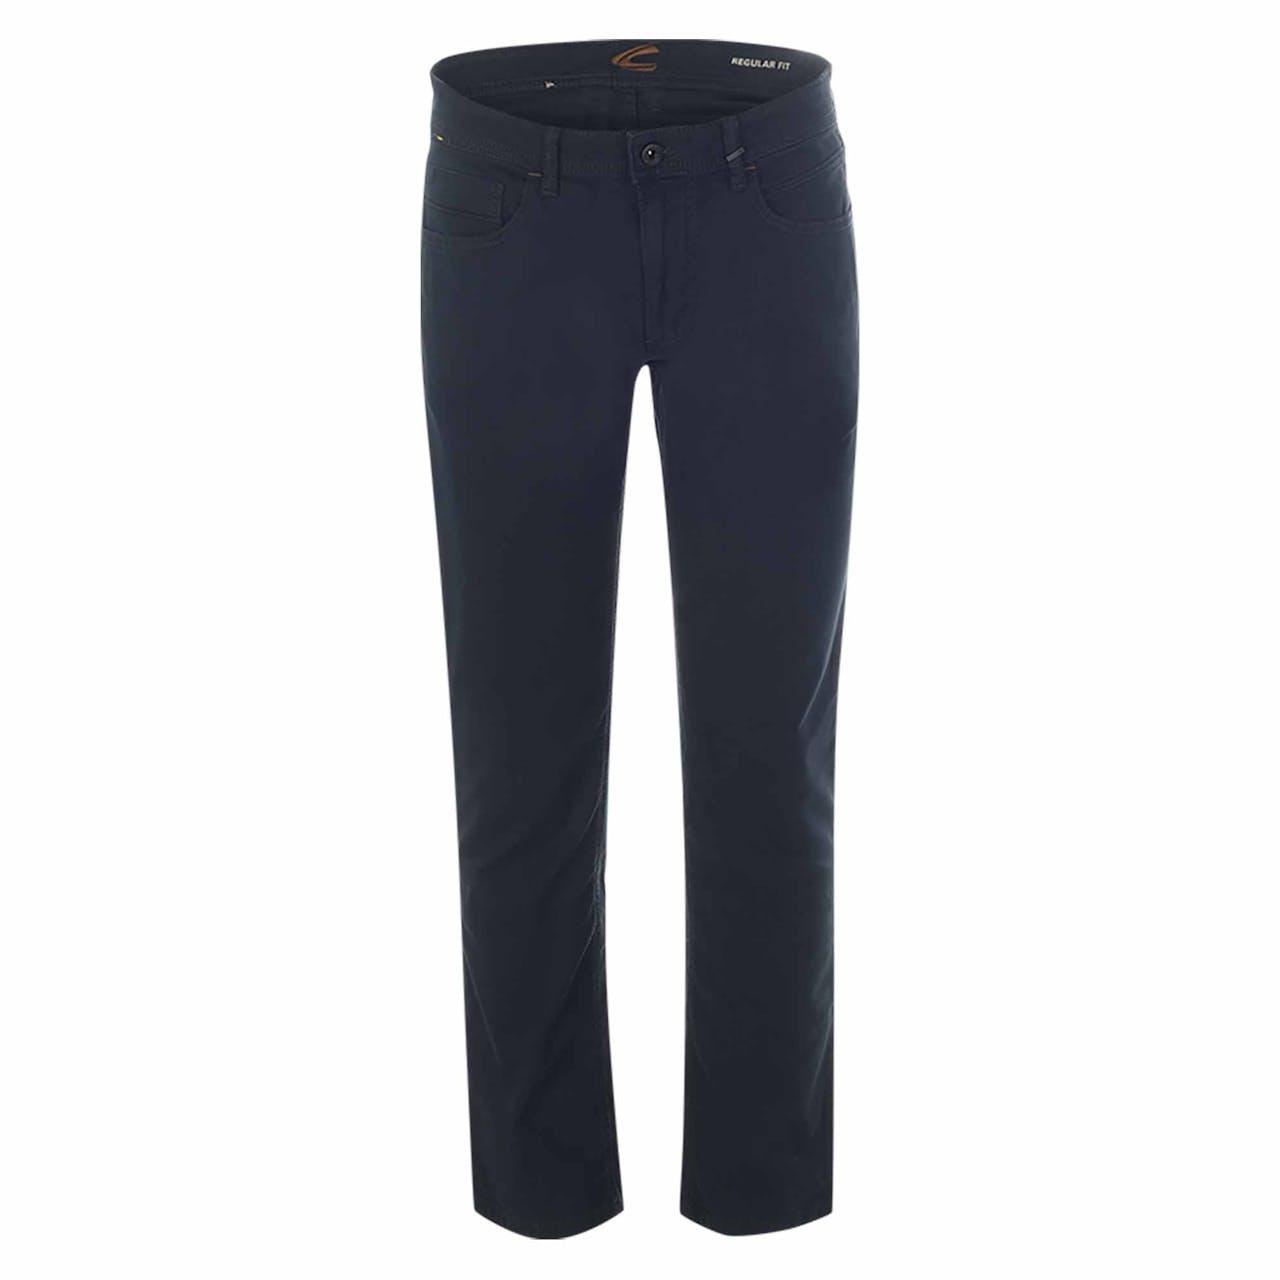 Jeans - Regular Fit - Houston